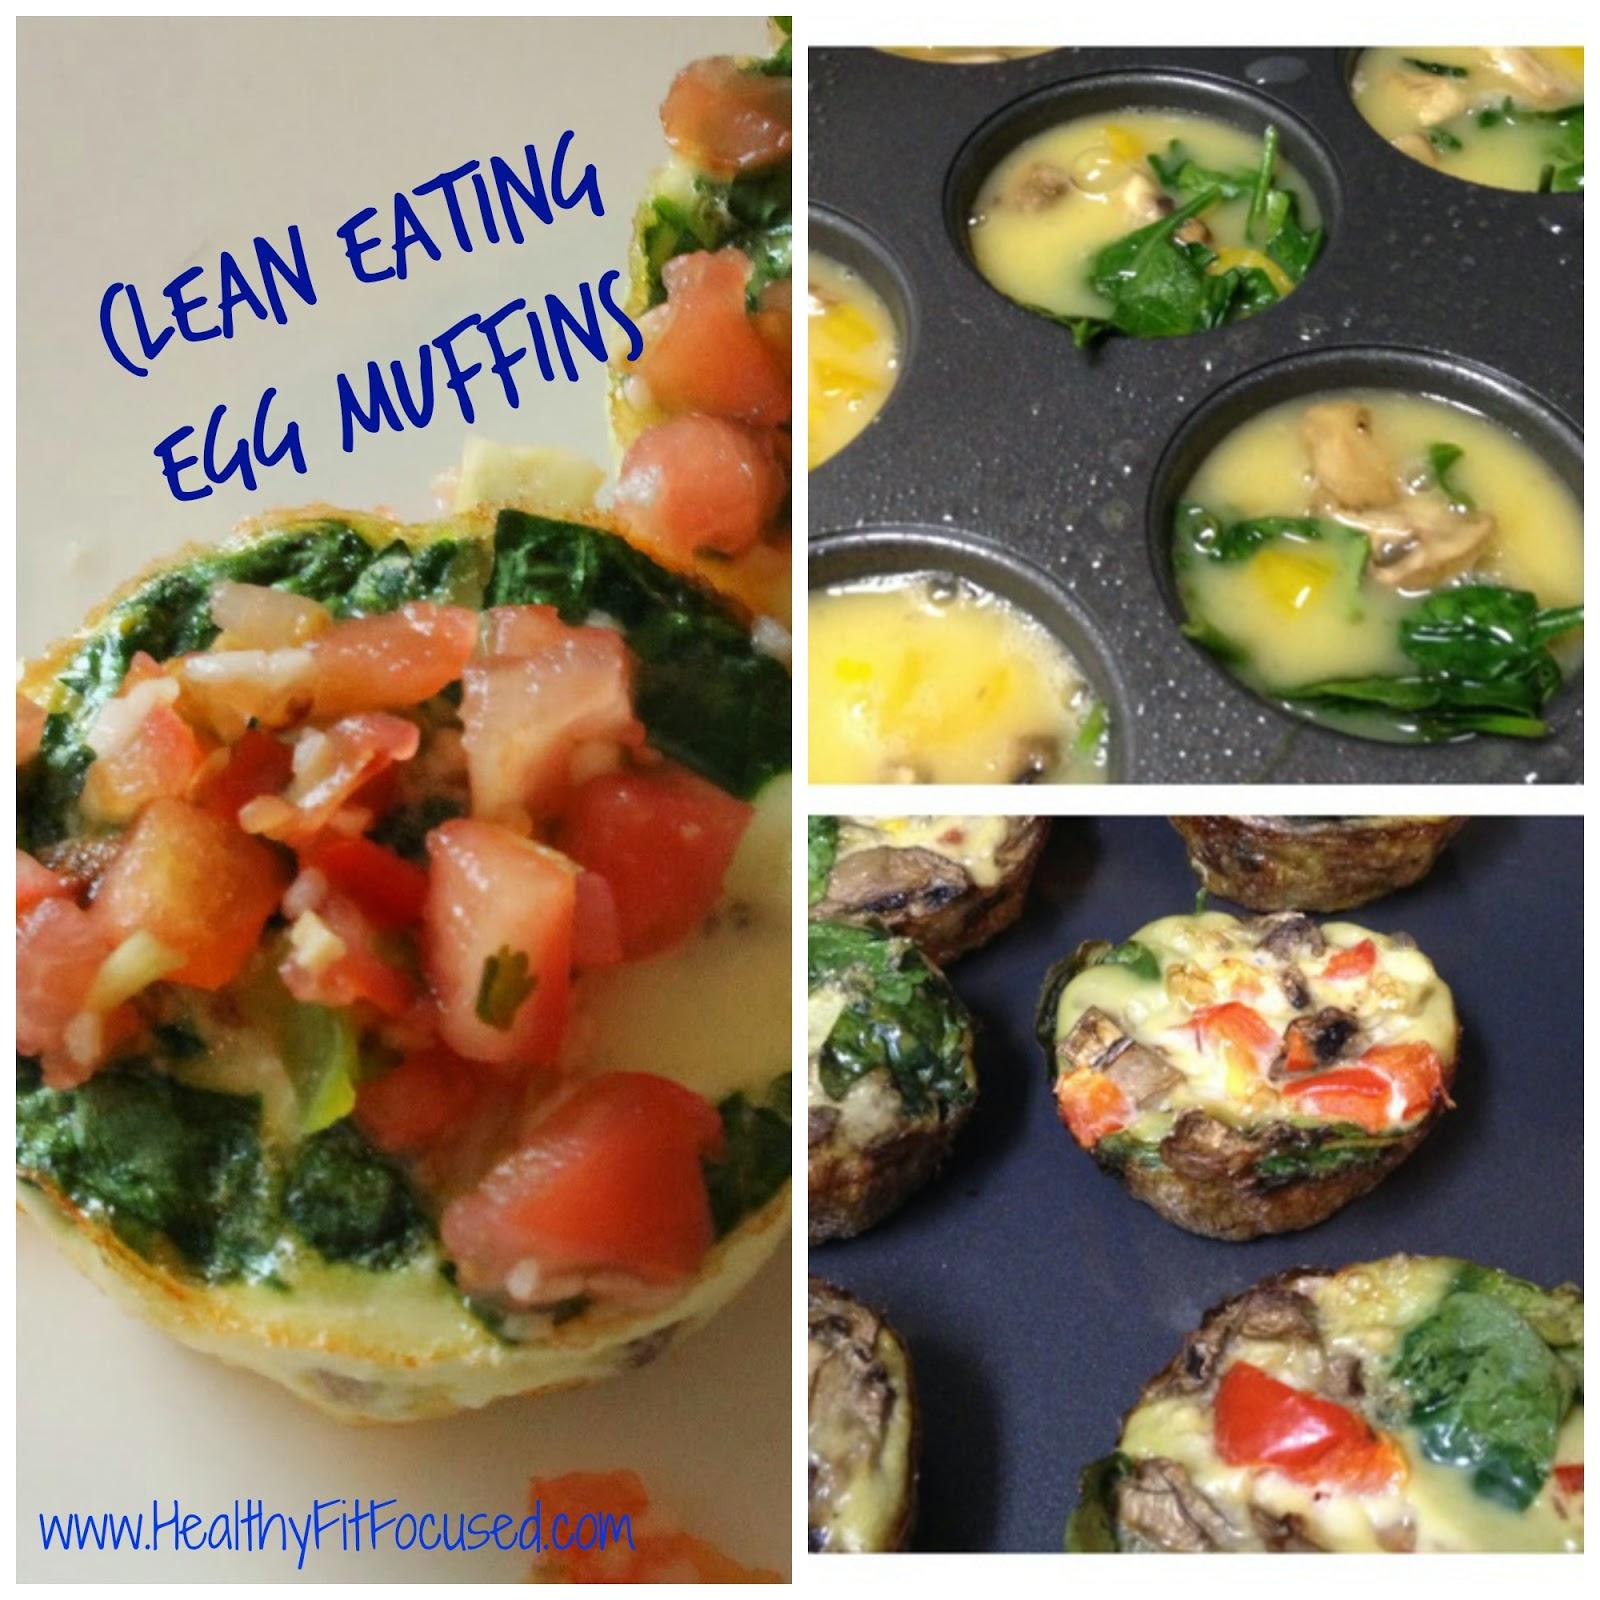 Egg Muffins, www.HealthyFitFocused.com